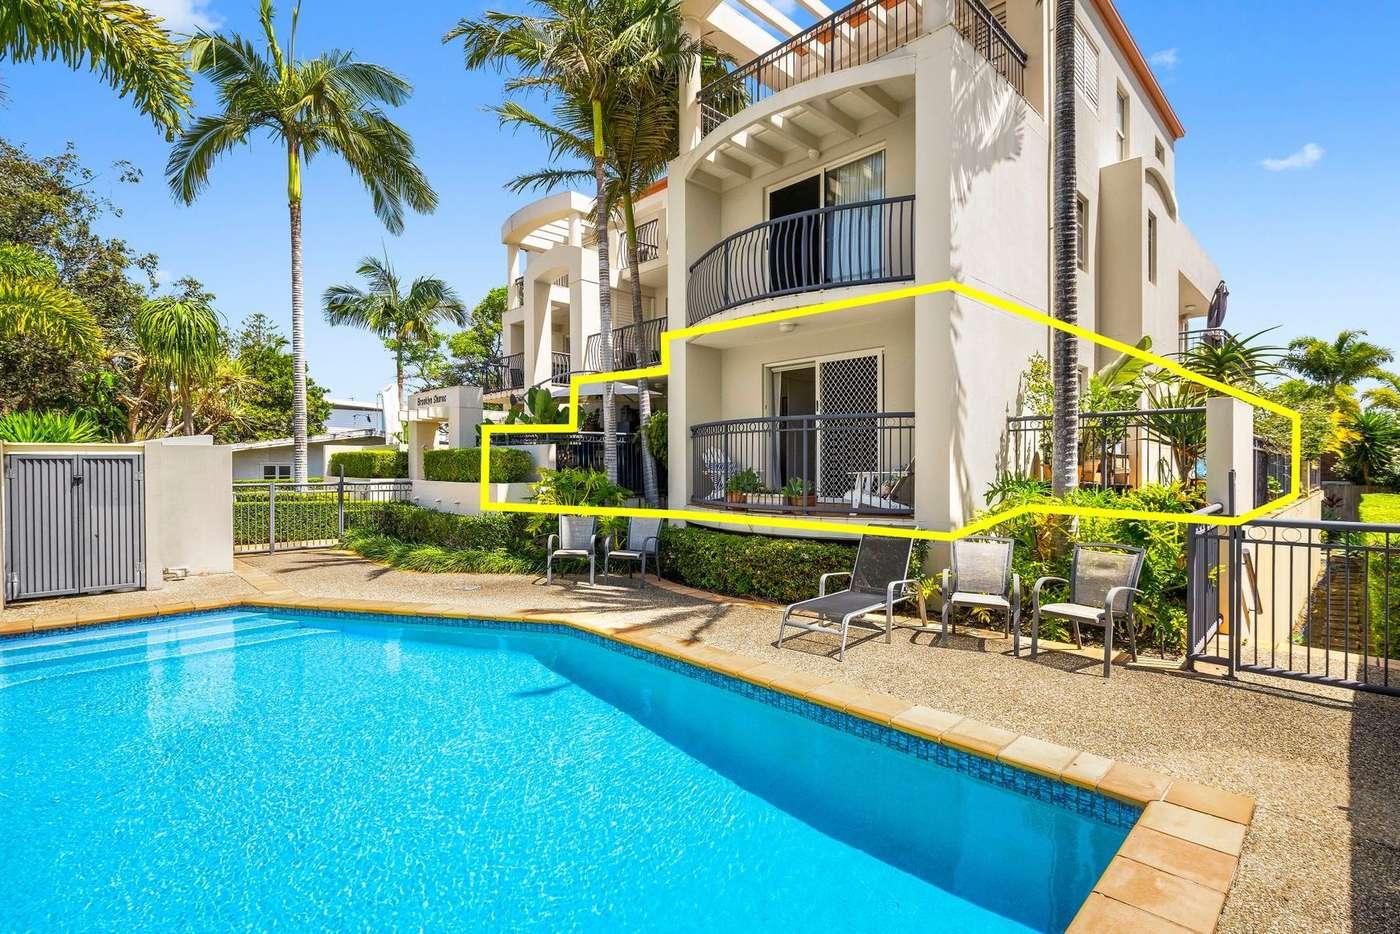 Main view of Homely apartment listing, 3/58 Petrel Avenue, Mermaid Beach, QLD 4218